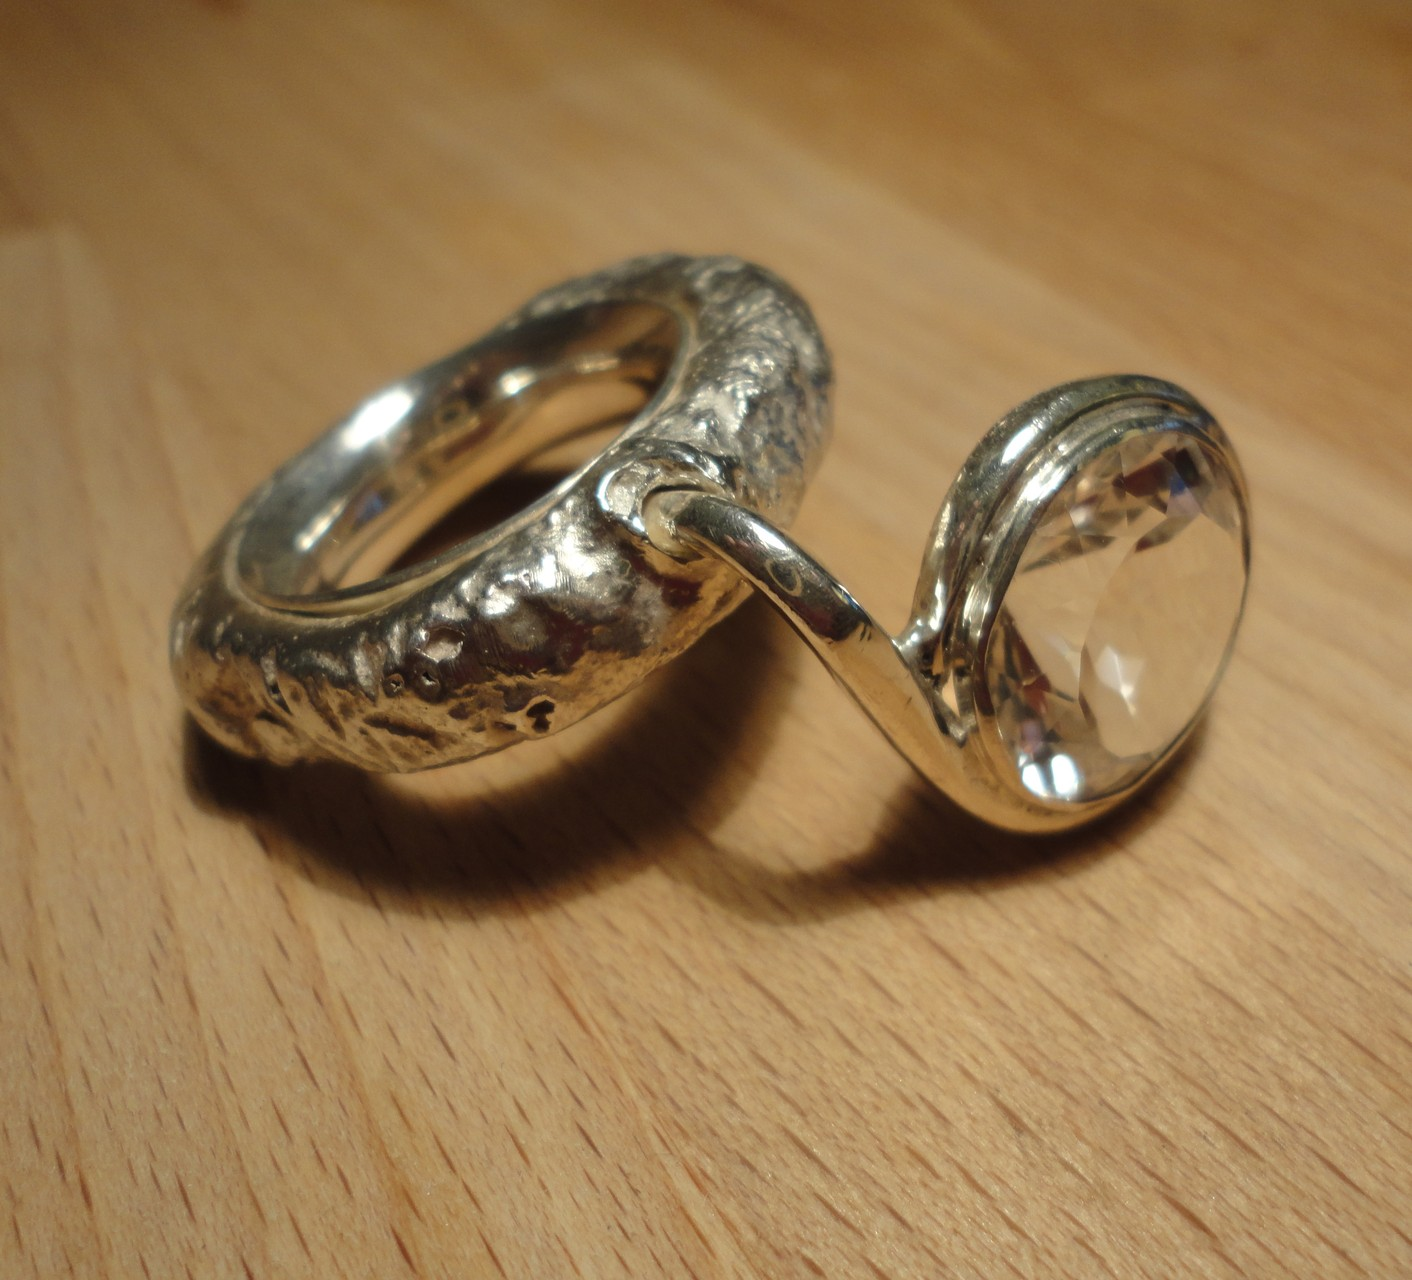 Silber-Daumenring: Glatter Innenring, massiver Aussenring mit grossem Bergkristall, der in der Daumen-/Zeigefinger-Kule tront (925 Sterlingsilber) Preis: CHF 380.-